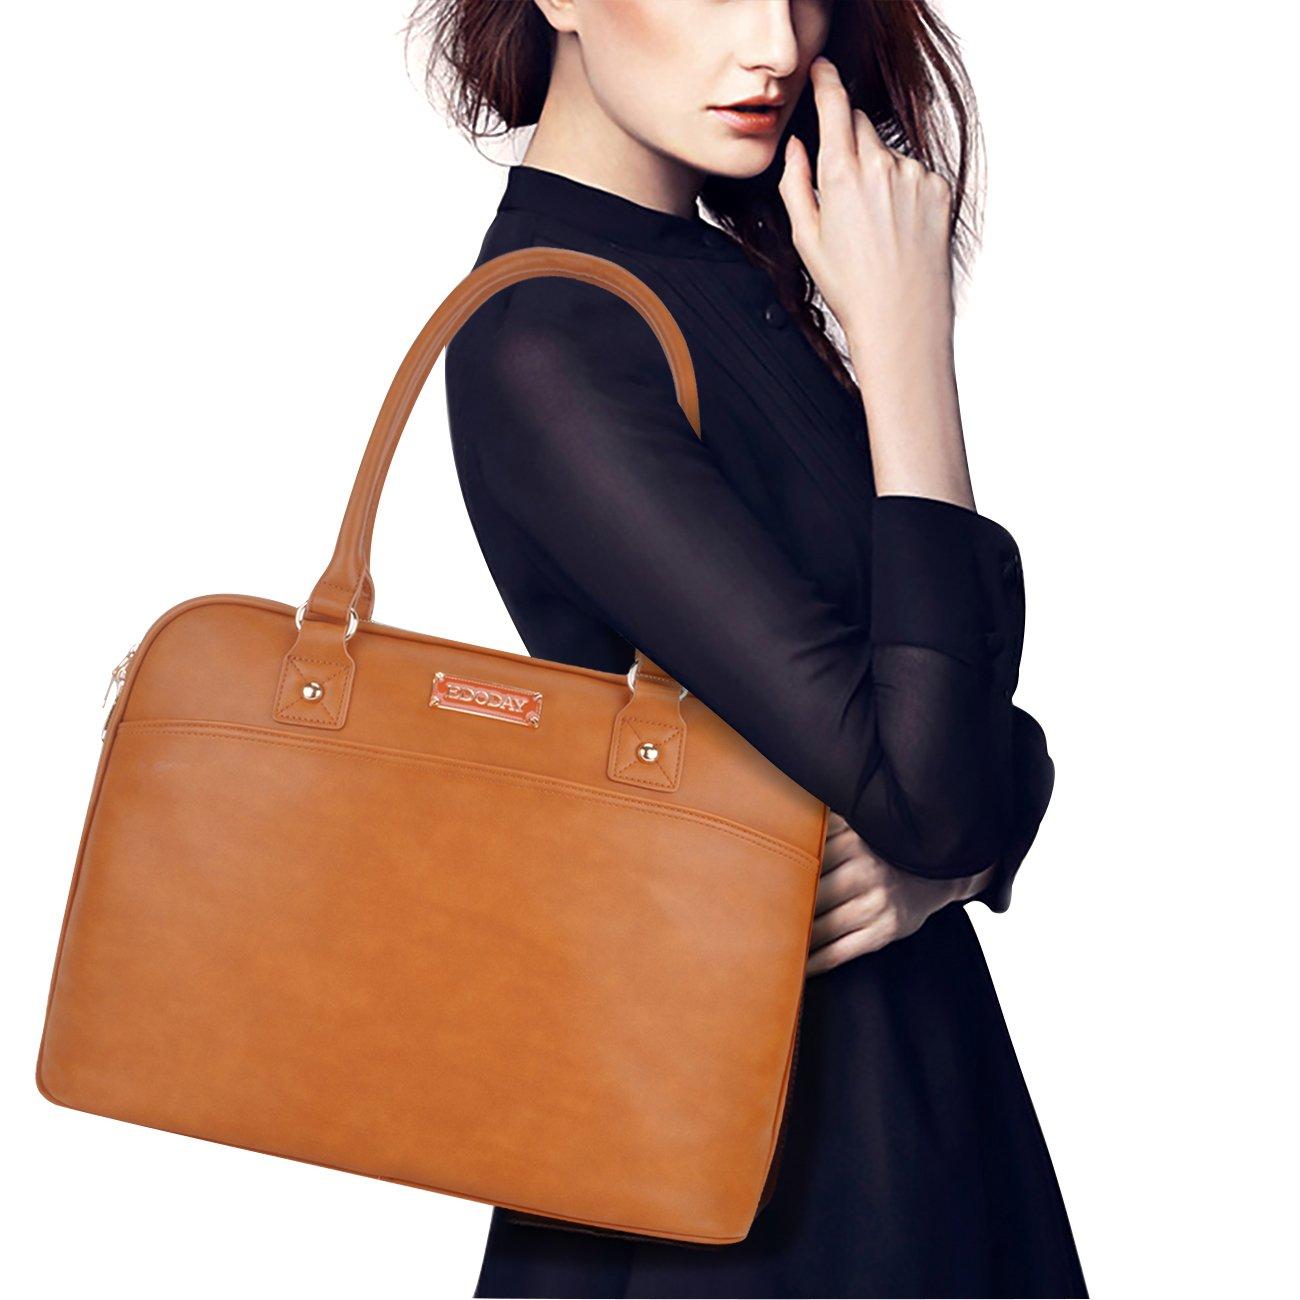 Laptop Tote Bag,15.6 Inch Tote Bag for Women Classic Laptop Case Shoulder Bag for Work[L0009/Brown]